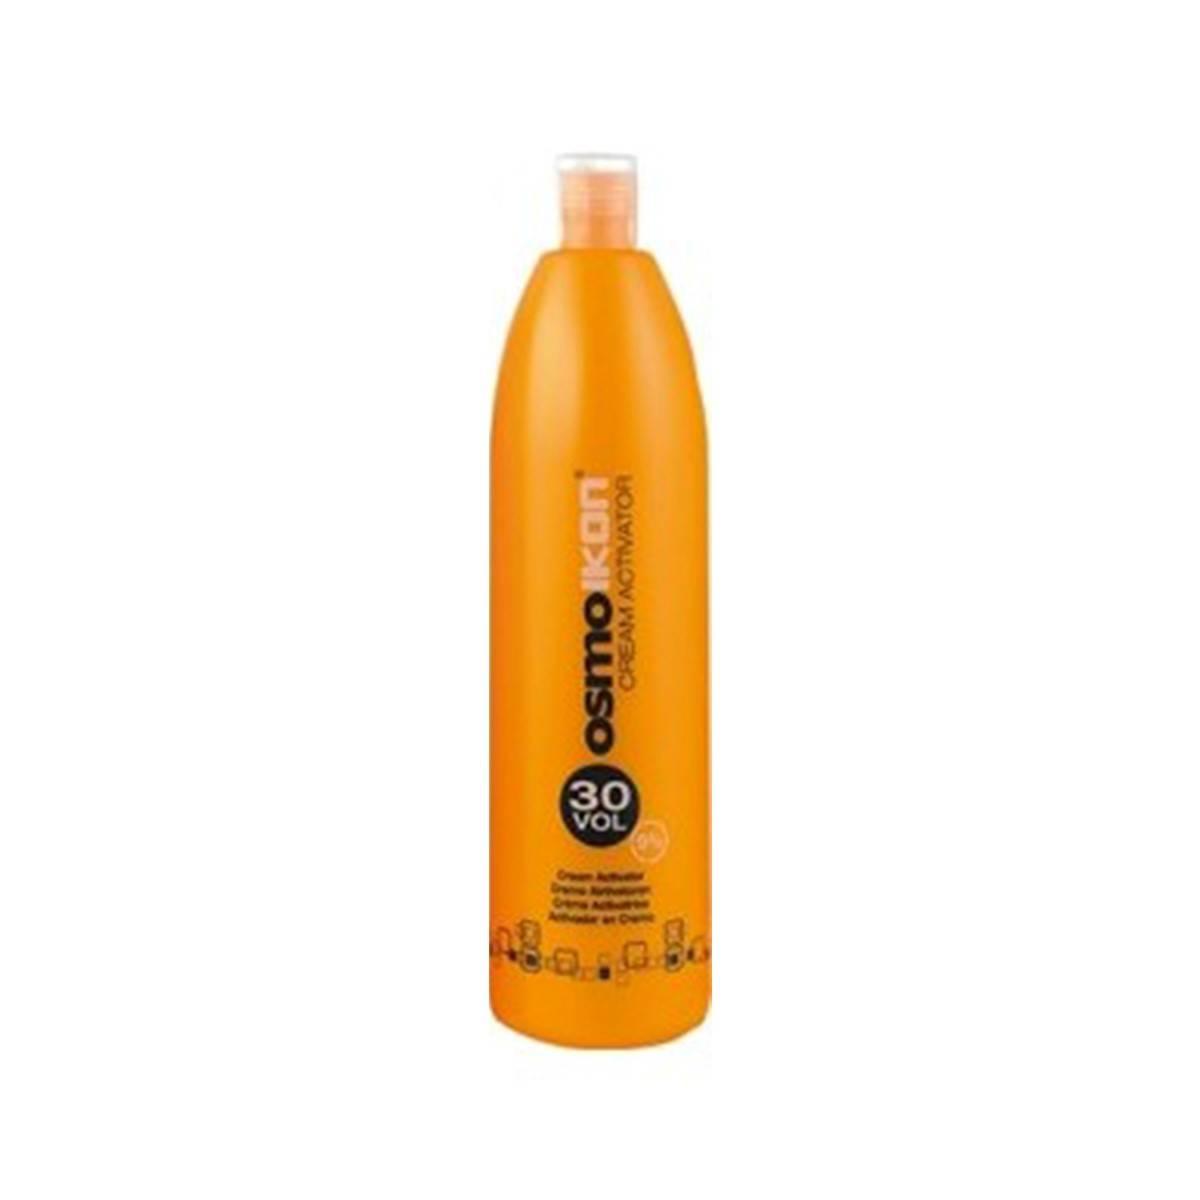 Osmo Ikon Cream Coact. 30 Vol Ossigeno 30 Vol